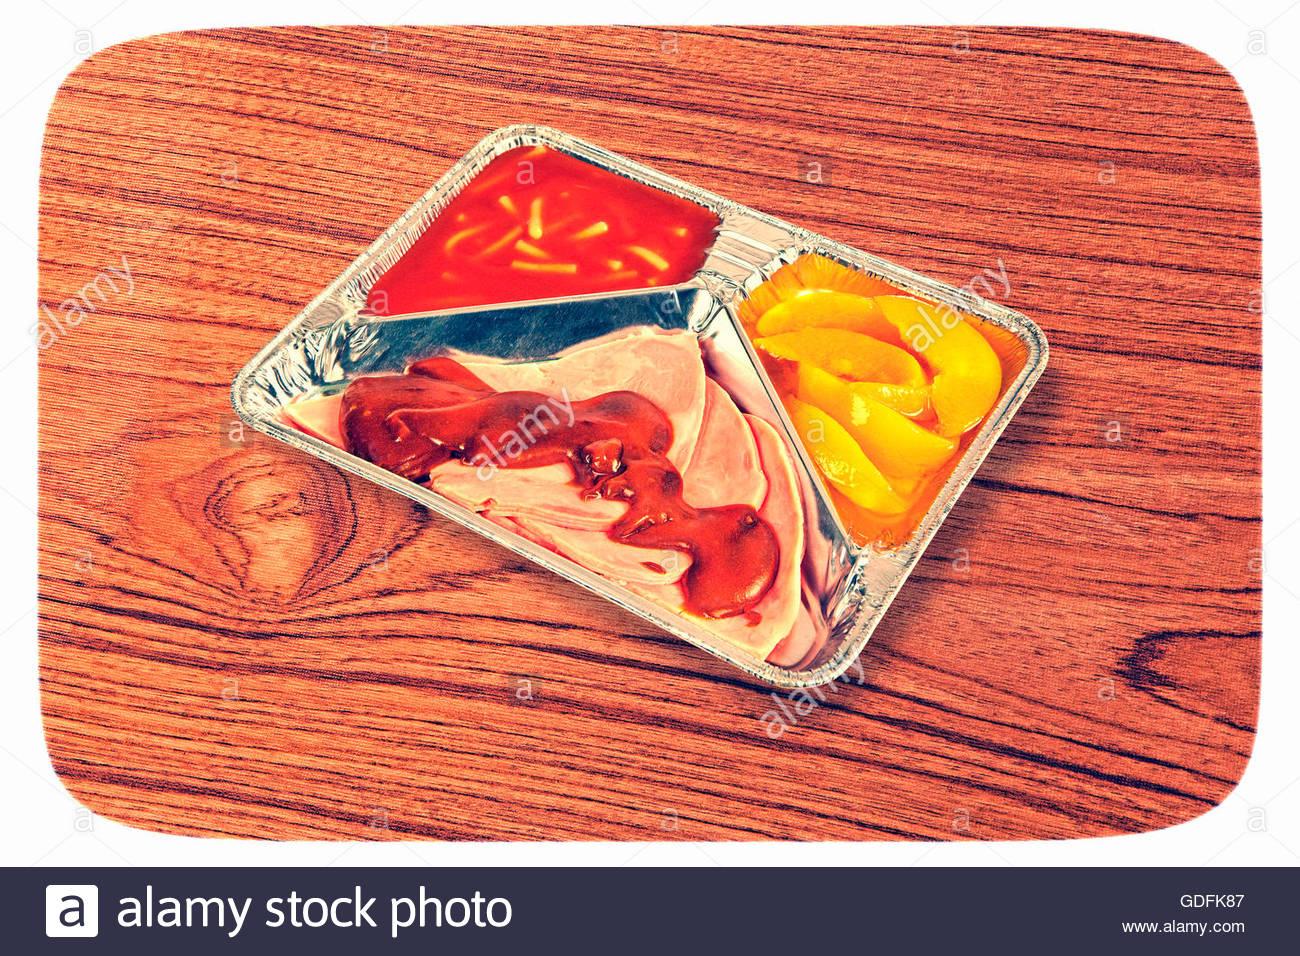 TV dinner tray vintage retro meal aluminium food dish on wooden table Stock Photo